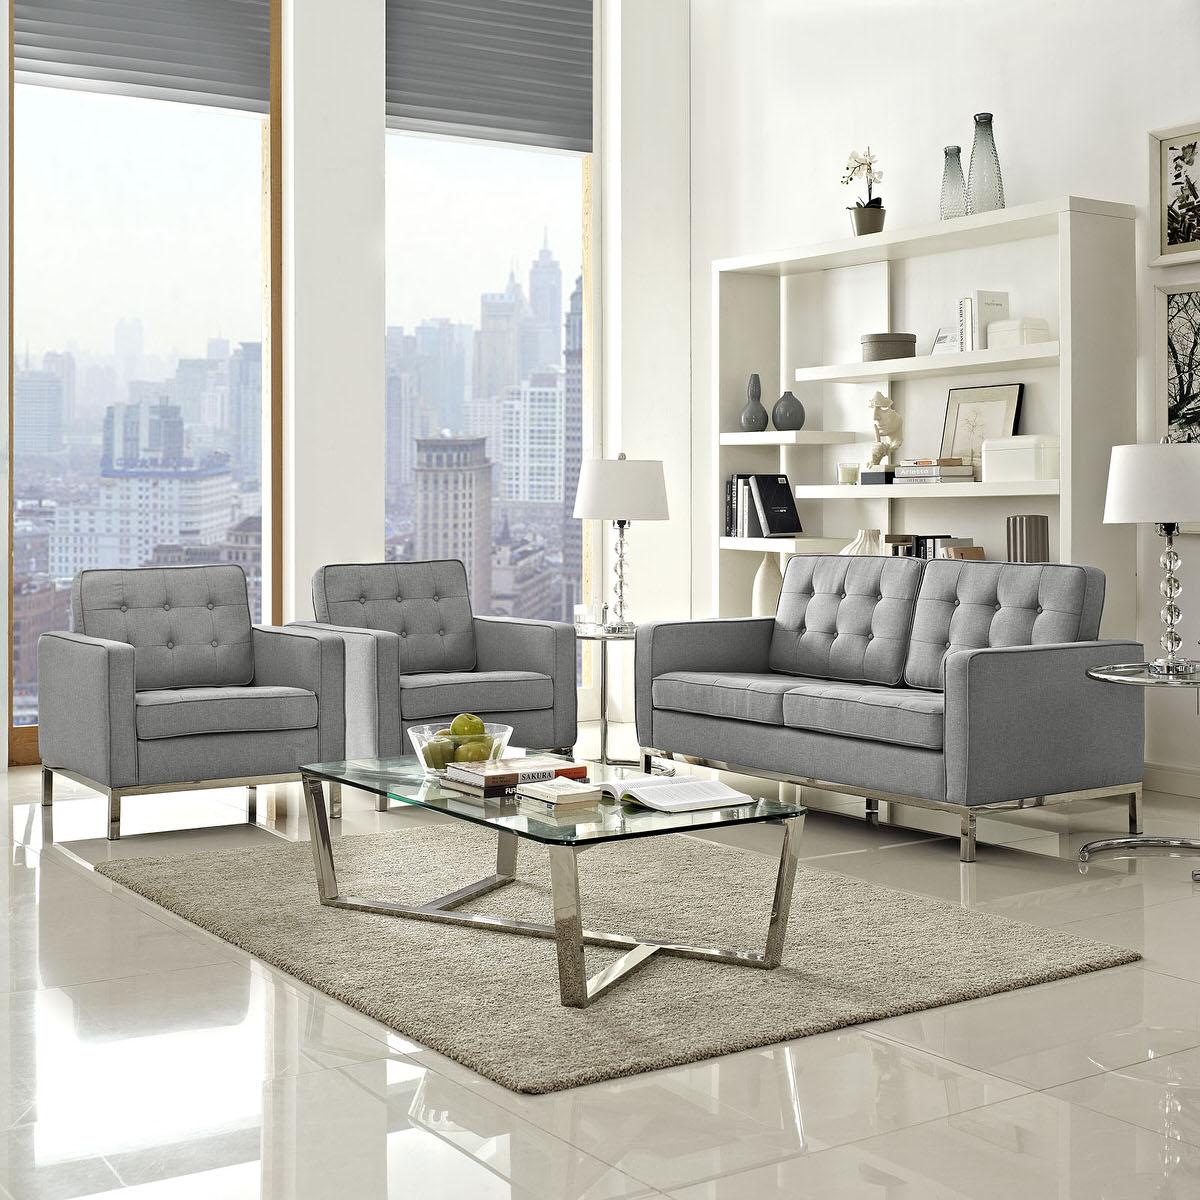 Loft Living Room Set Upholstered Fabric Set of 3 Light Gray by ...